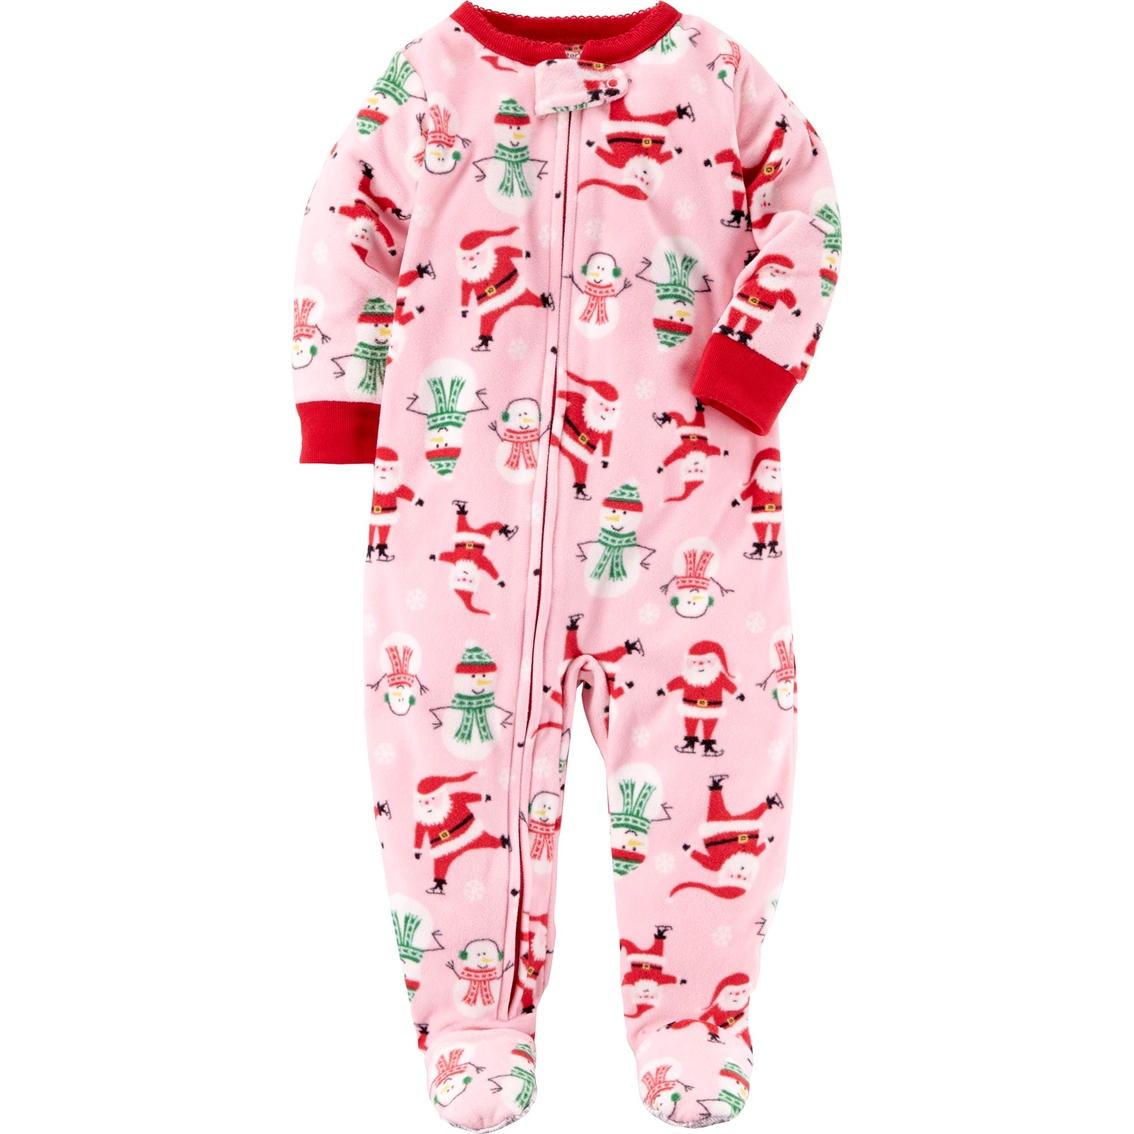 d5c7c32d4927 Carter s Infant Girls Snowman Footed Pajamas